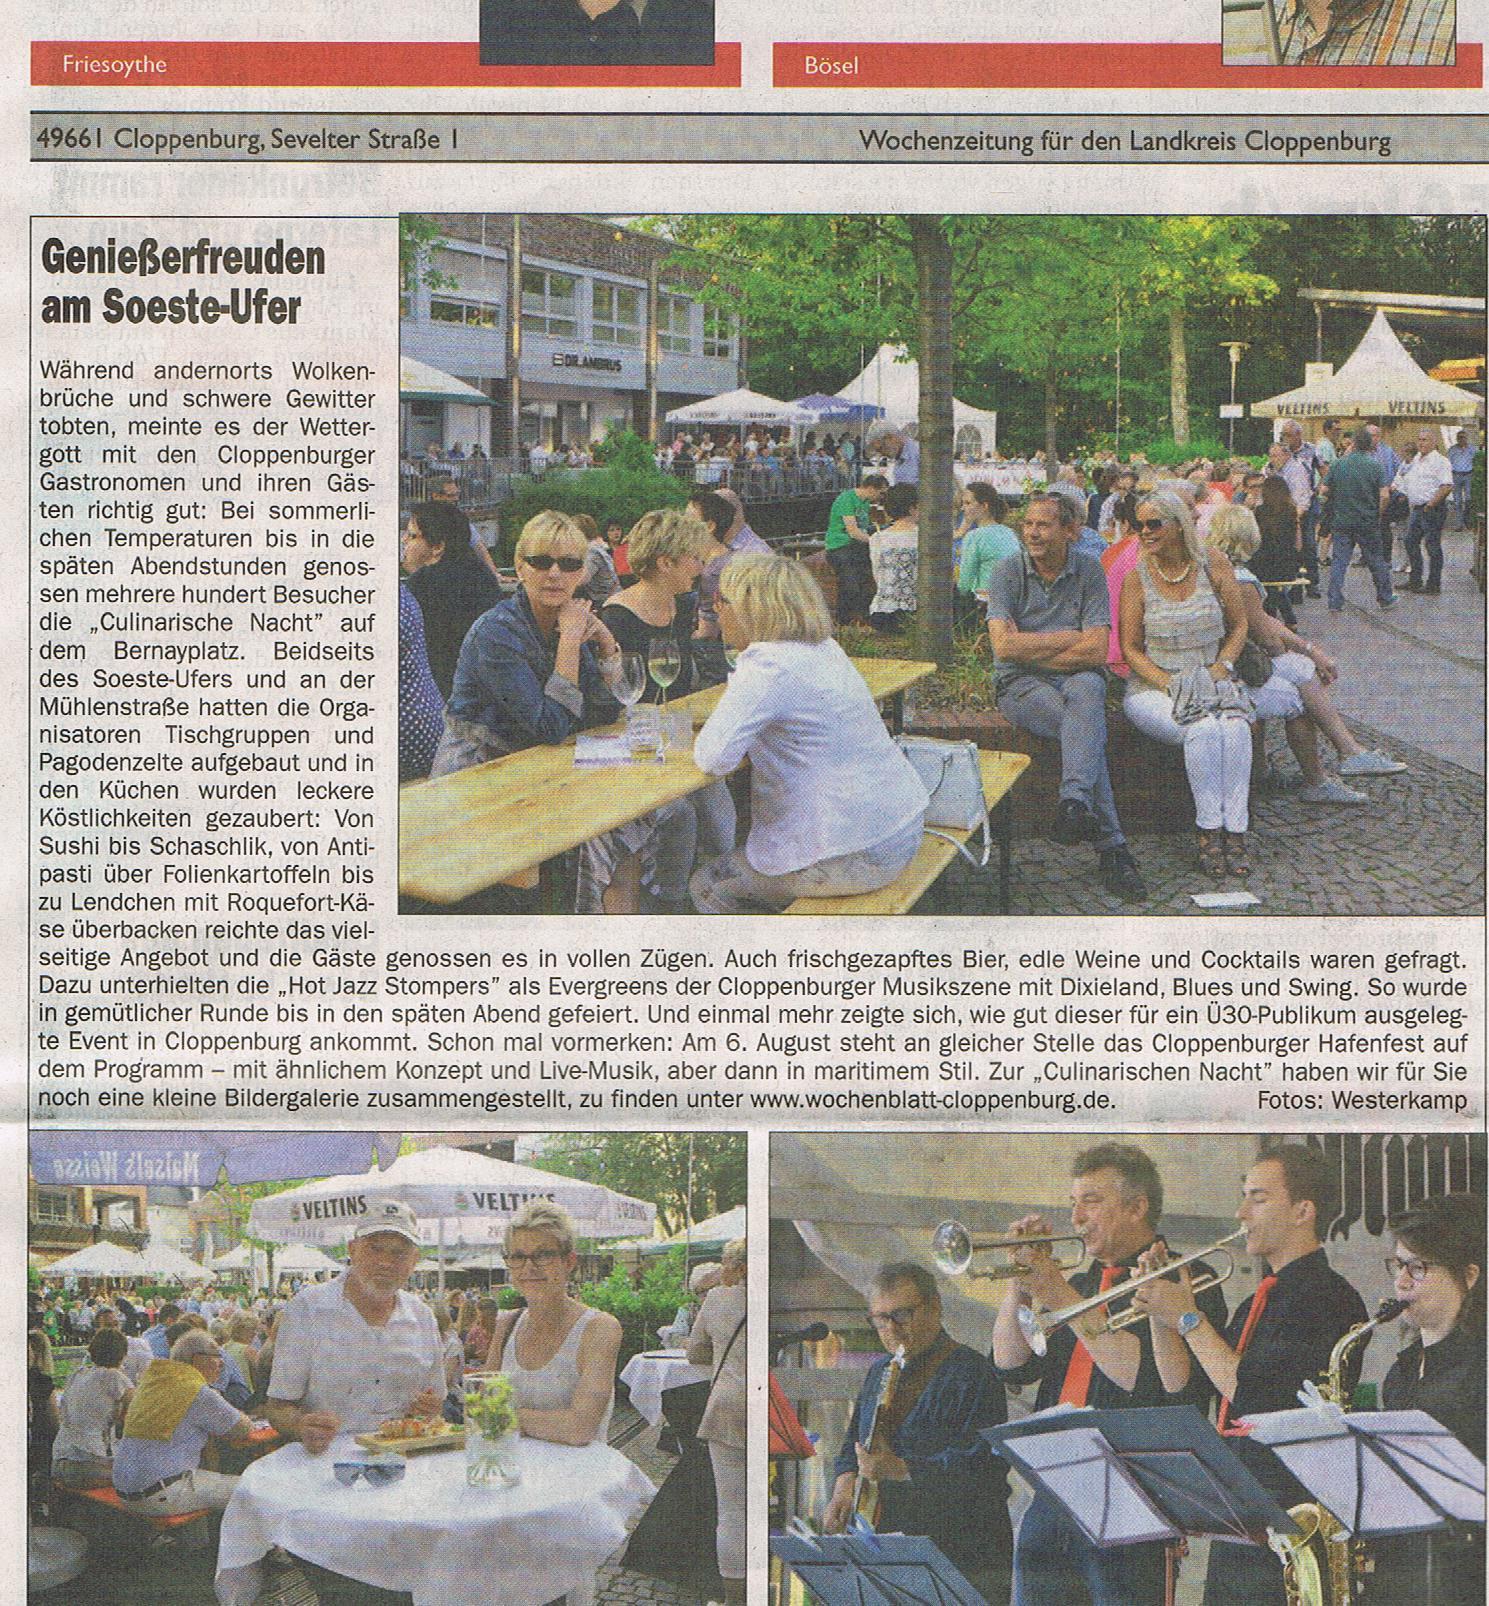 2016-06-08 Wochenblatt